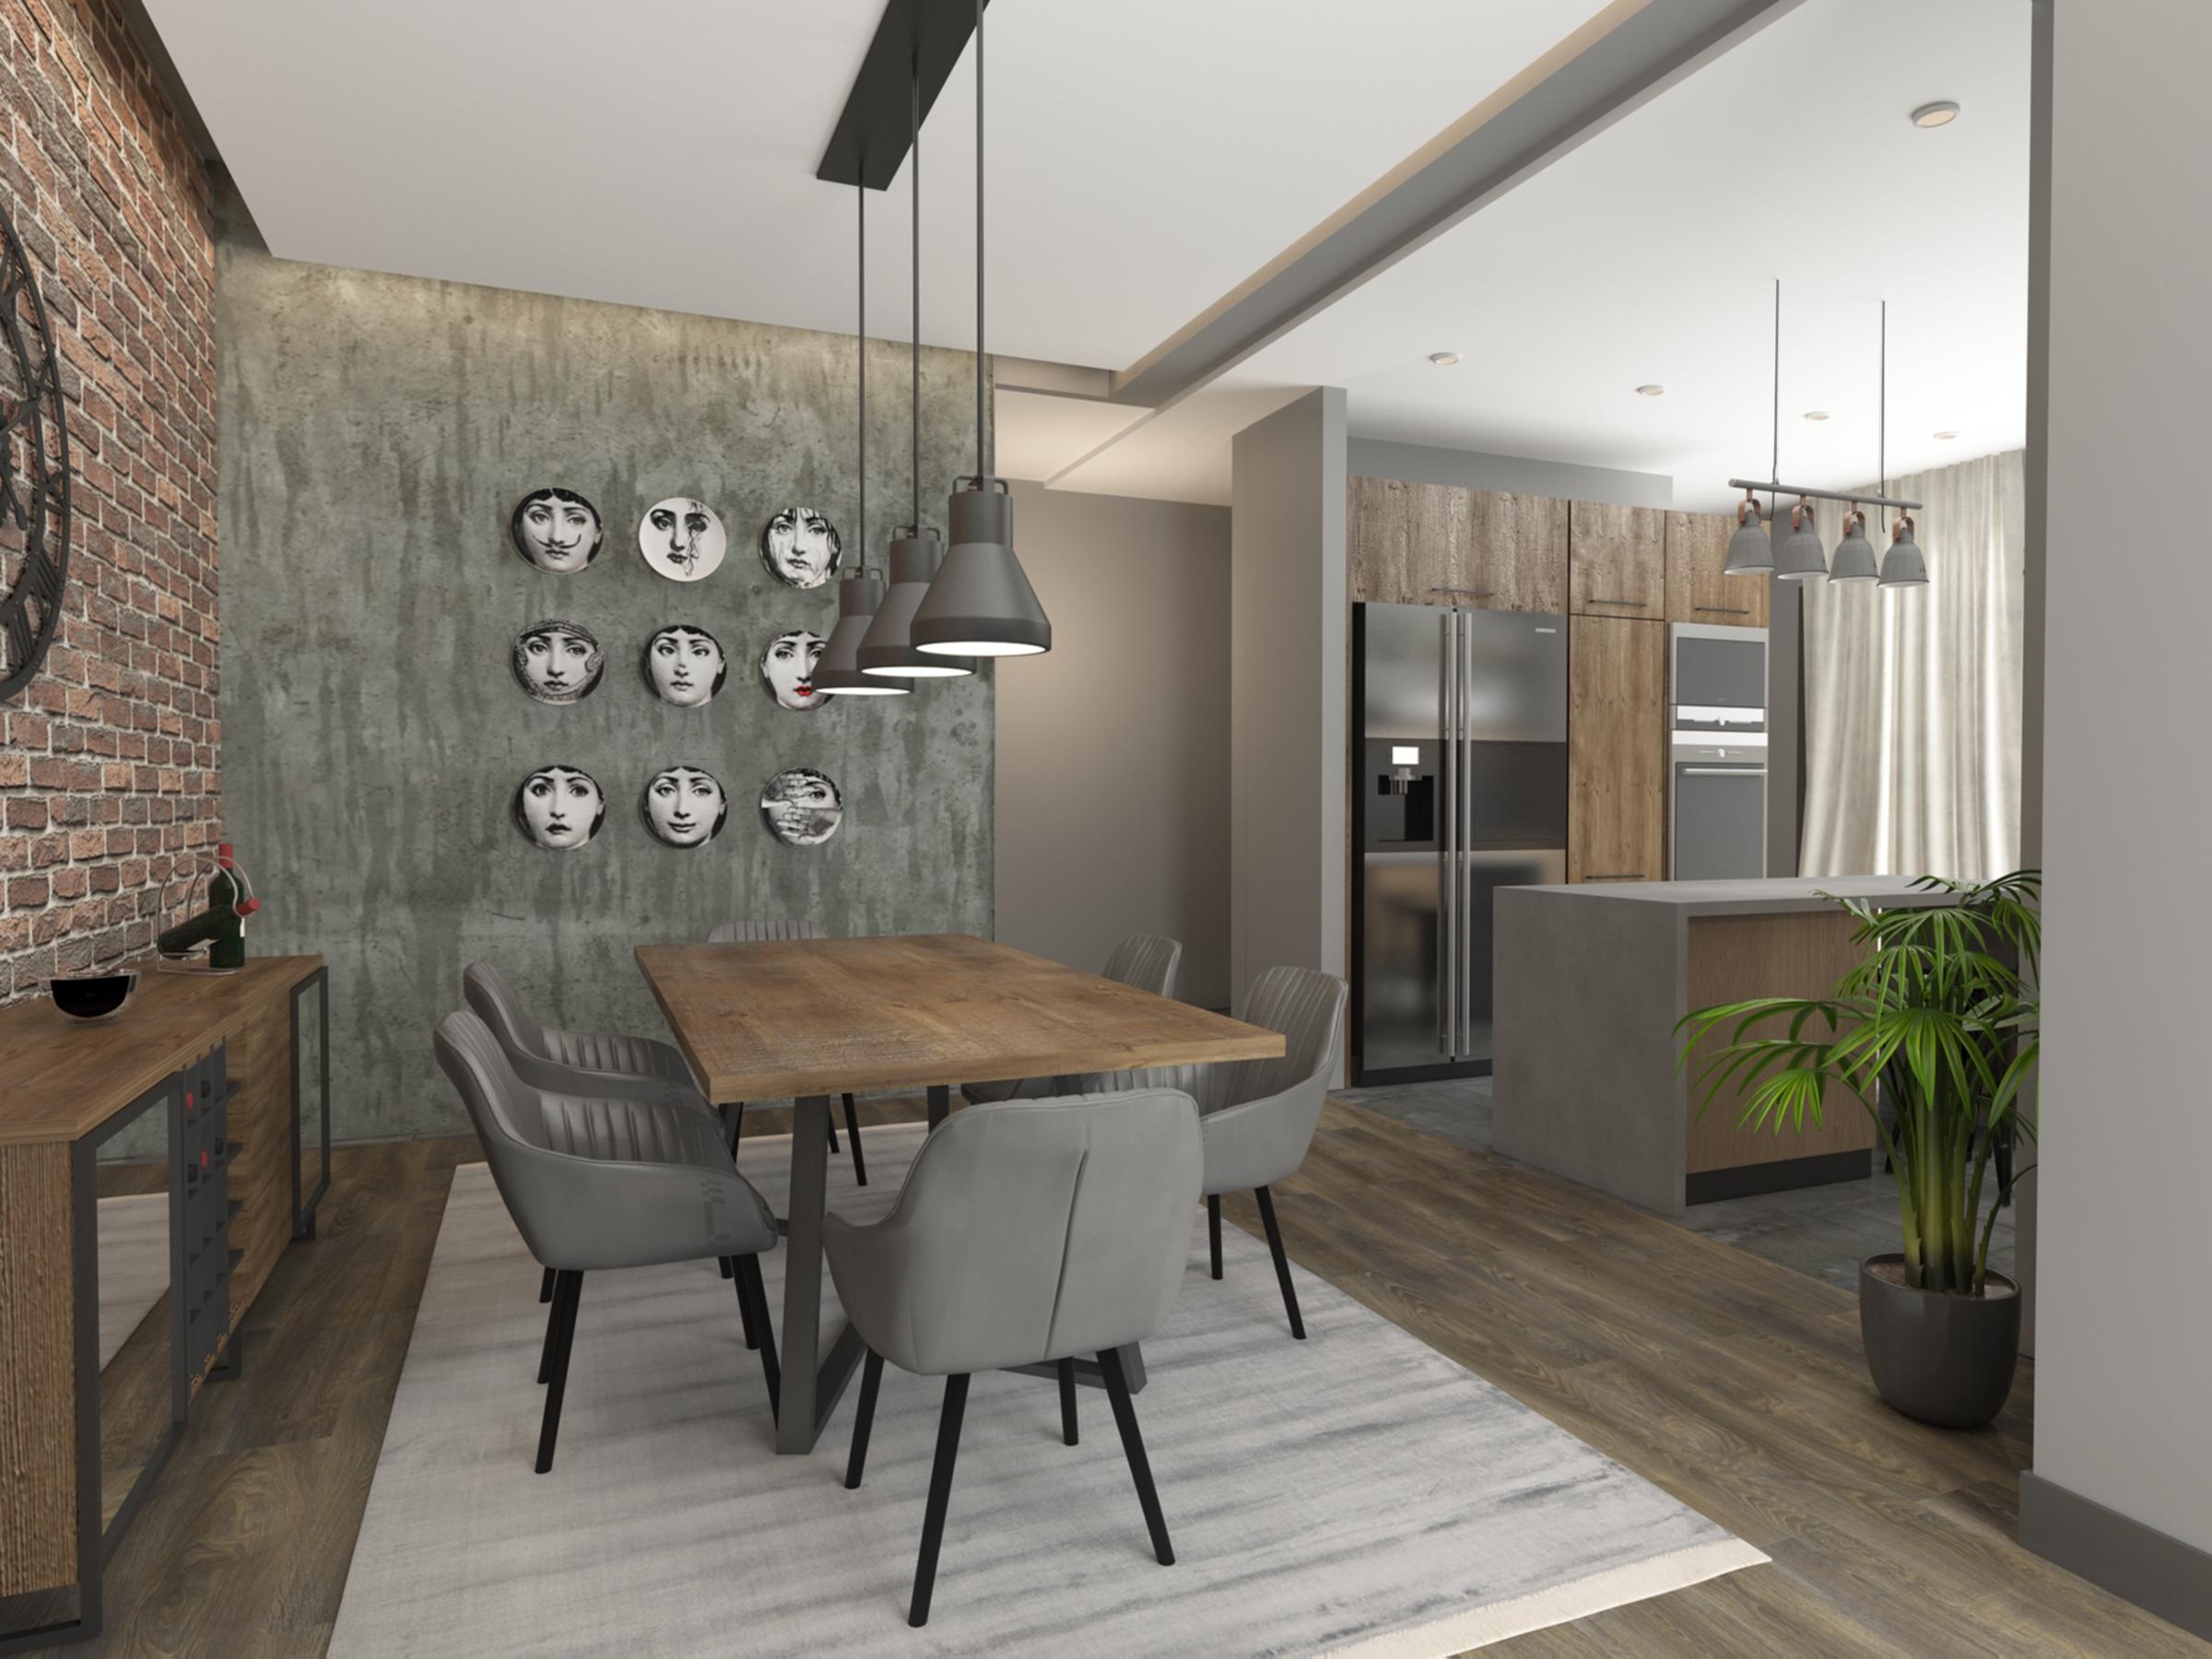 Dining room in Apartment for Sale at Baraka Residence in Nyarutarama, Kigali